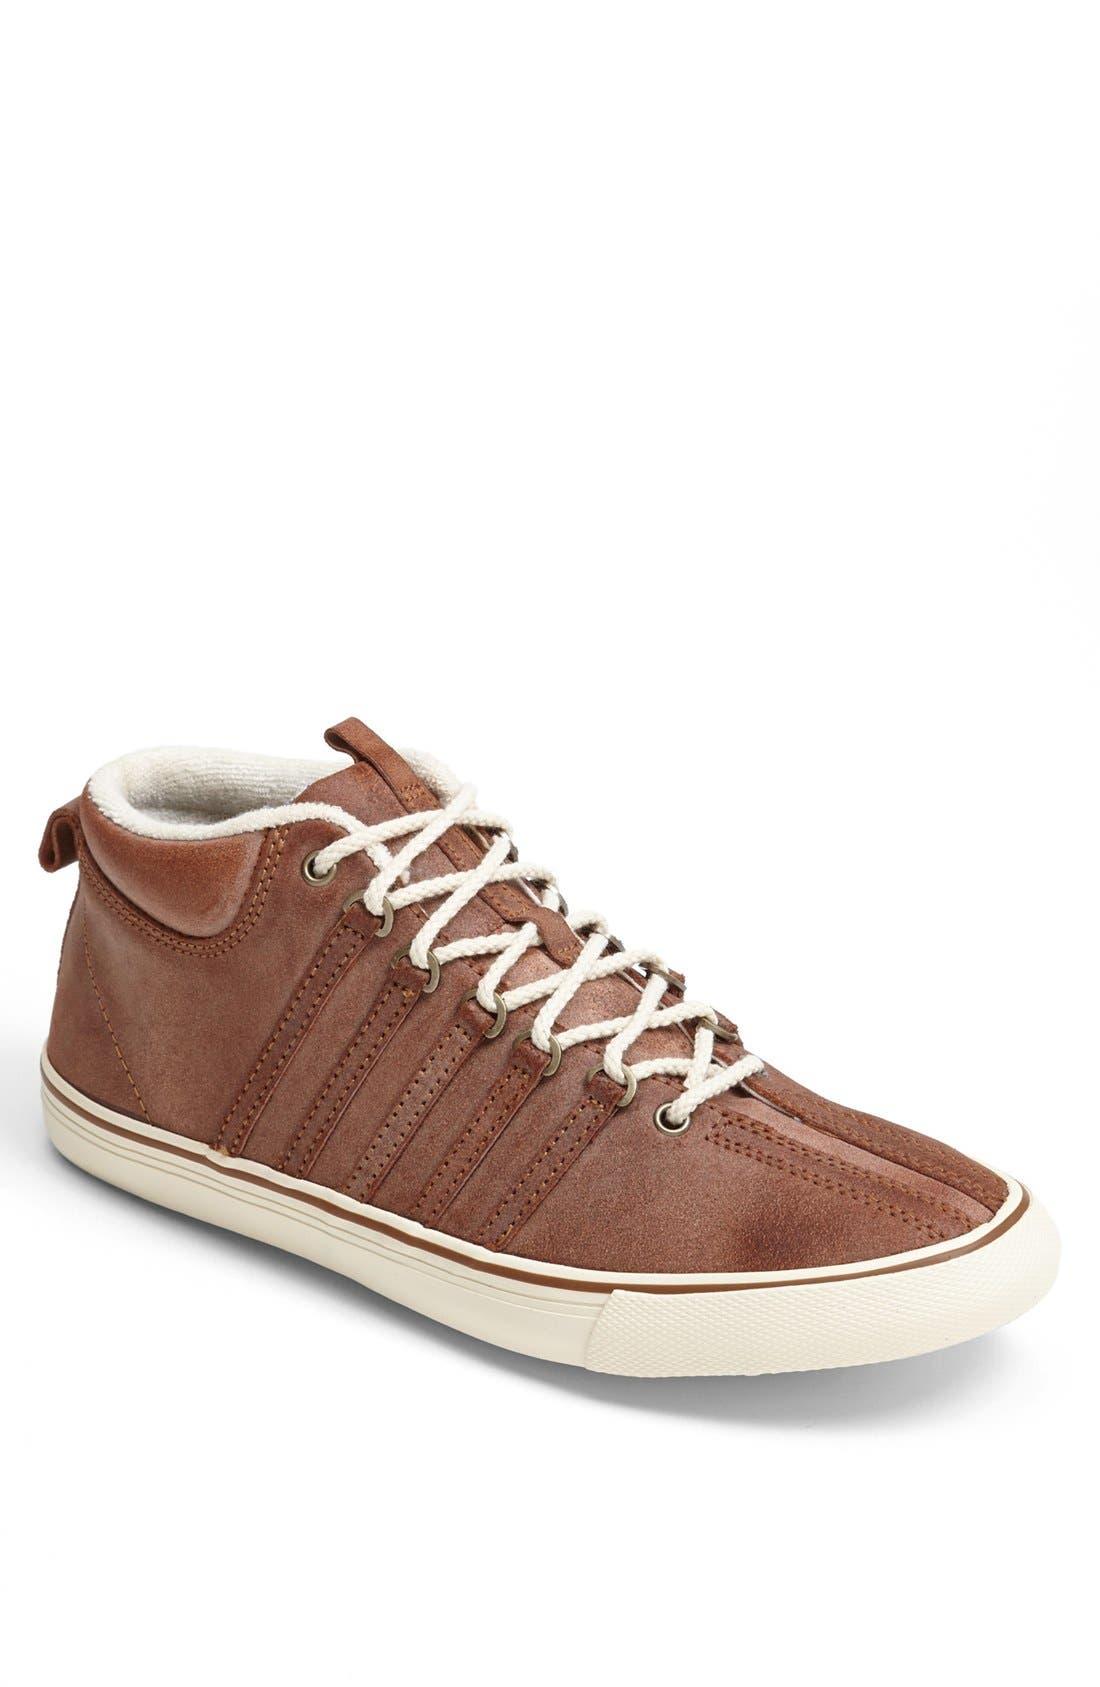 Main Image - K-Swiss 'Billy Reid Venice' Chukka Sneaker (Men)